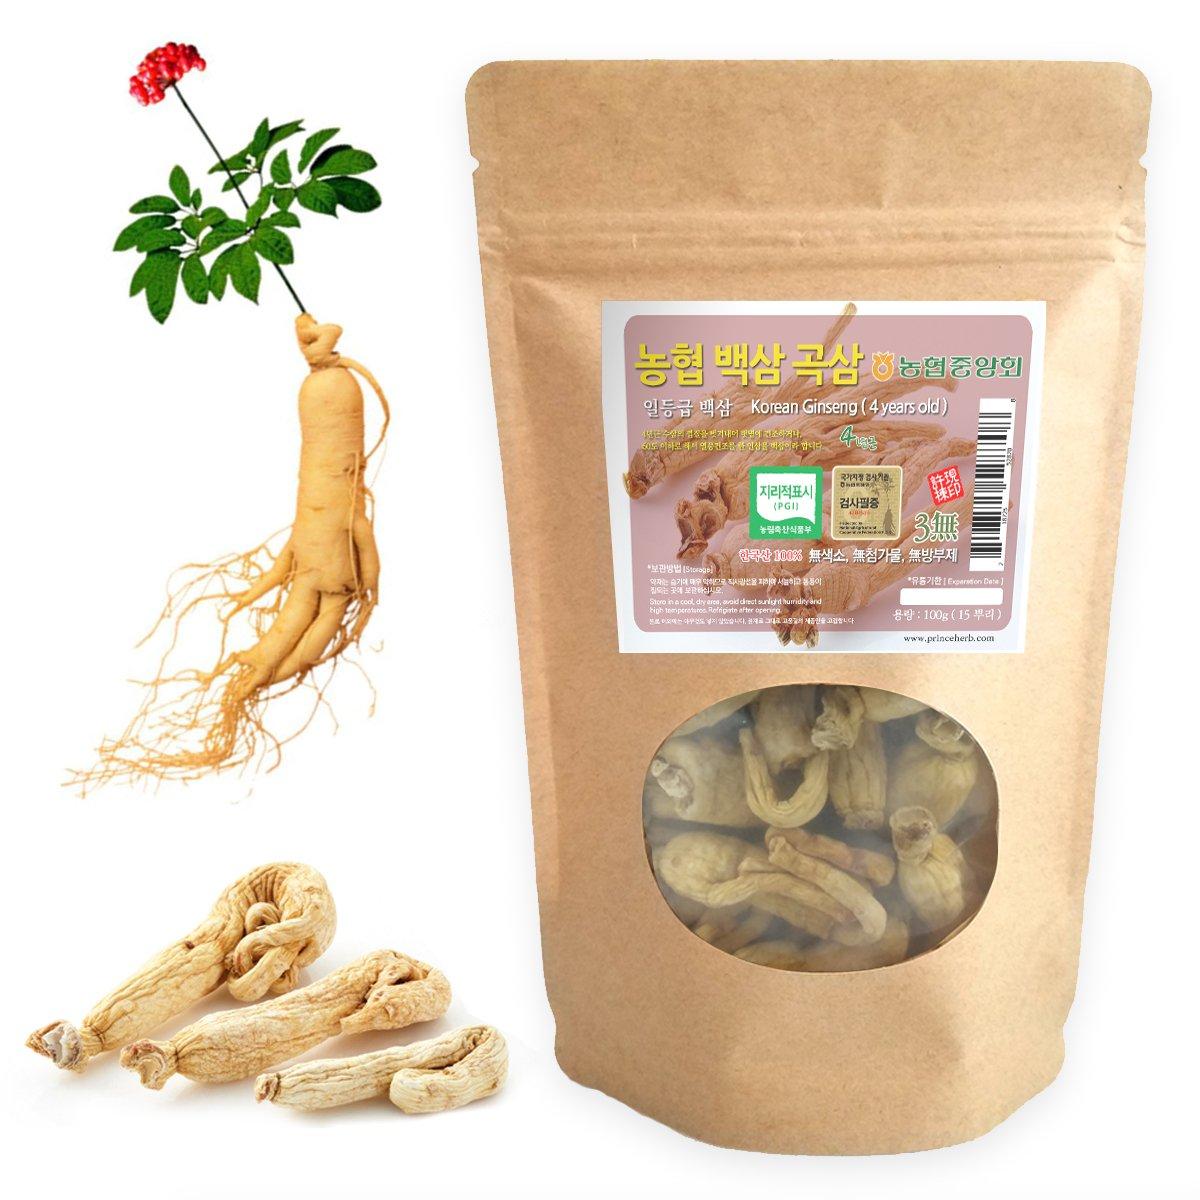 [Medicinal Korean Herb] 4 Years Old Korean Ginseng (Renshen/인삼) Dried Bulk Herbs 100g (15 roots) by HERBstory